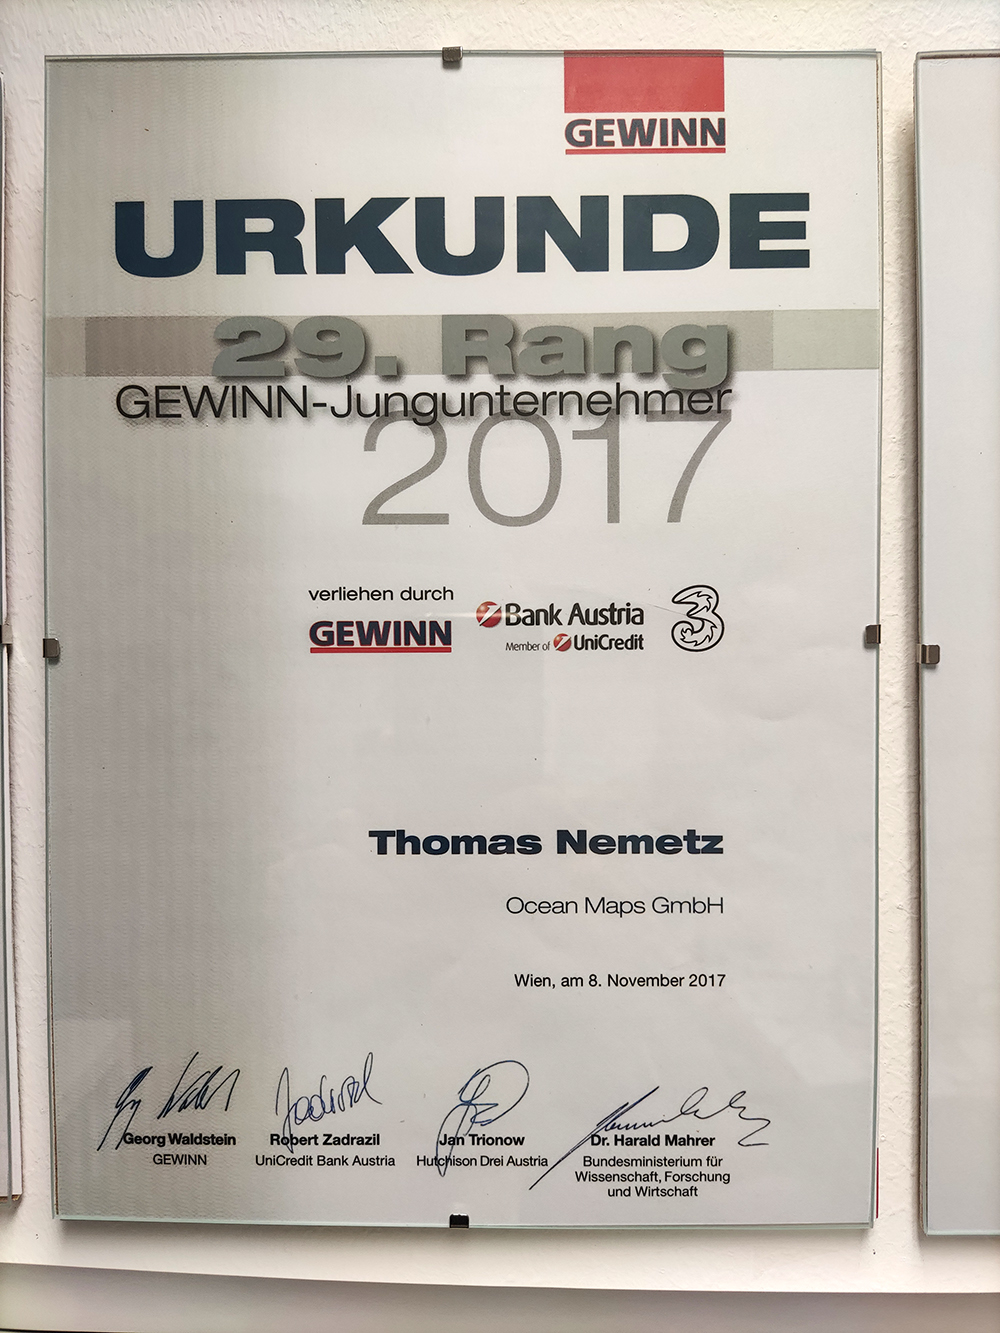 GEWINN-Jungunternehmen Ocean-Maps-GmbH 2017